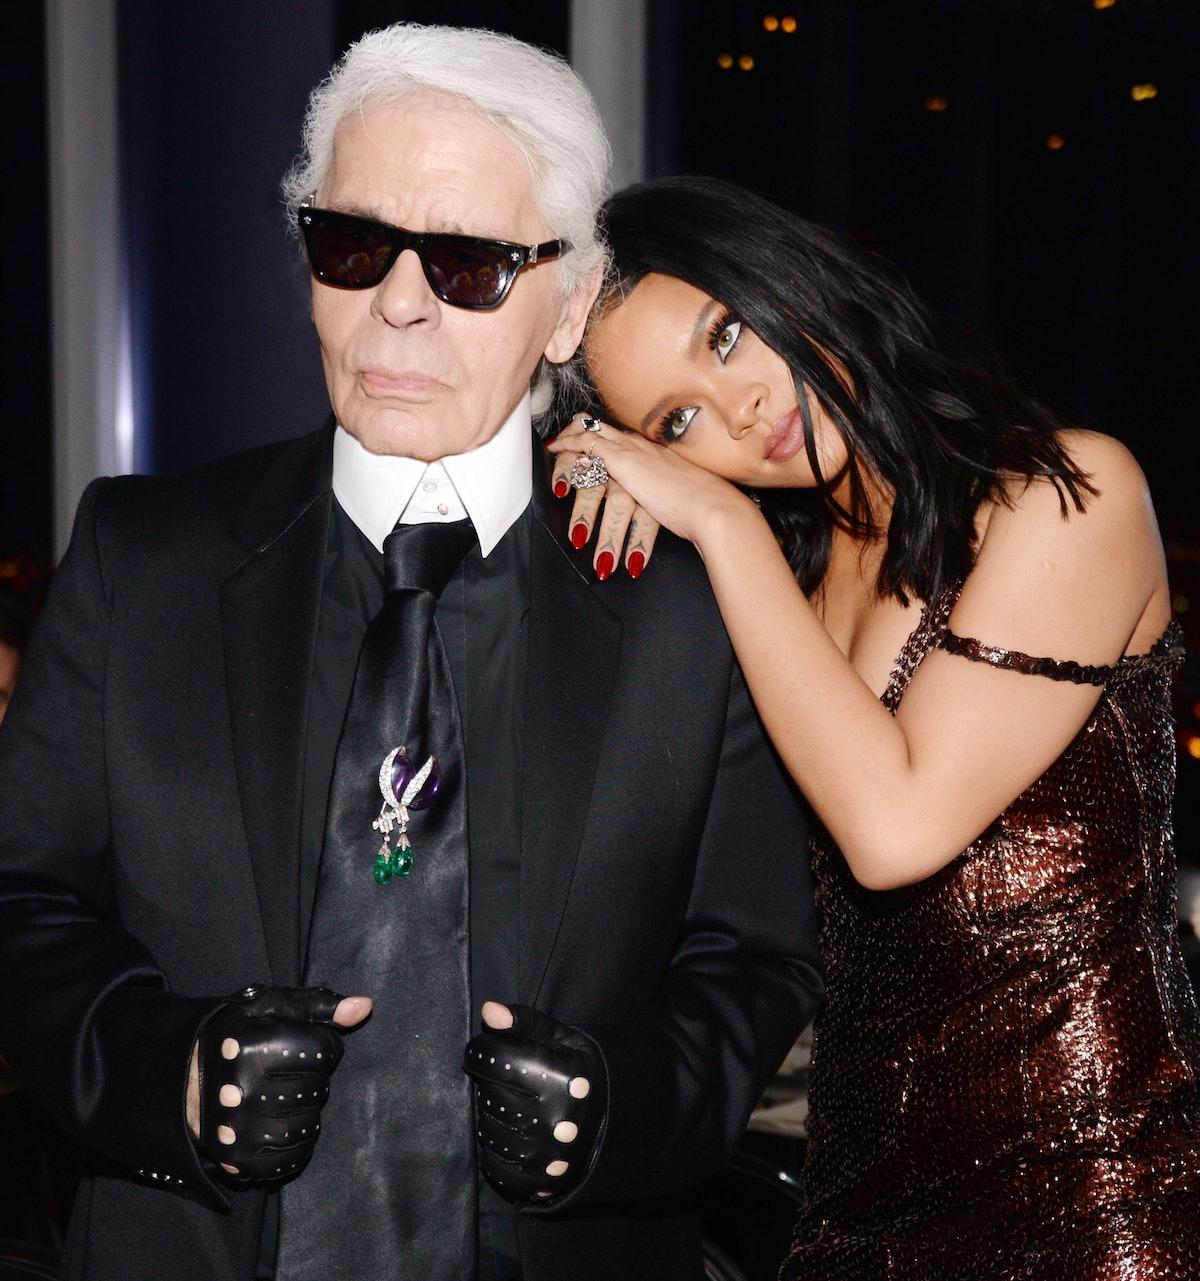 Karl Lagerfeld and Rihanna